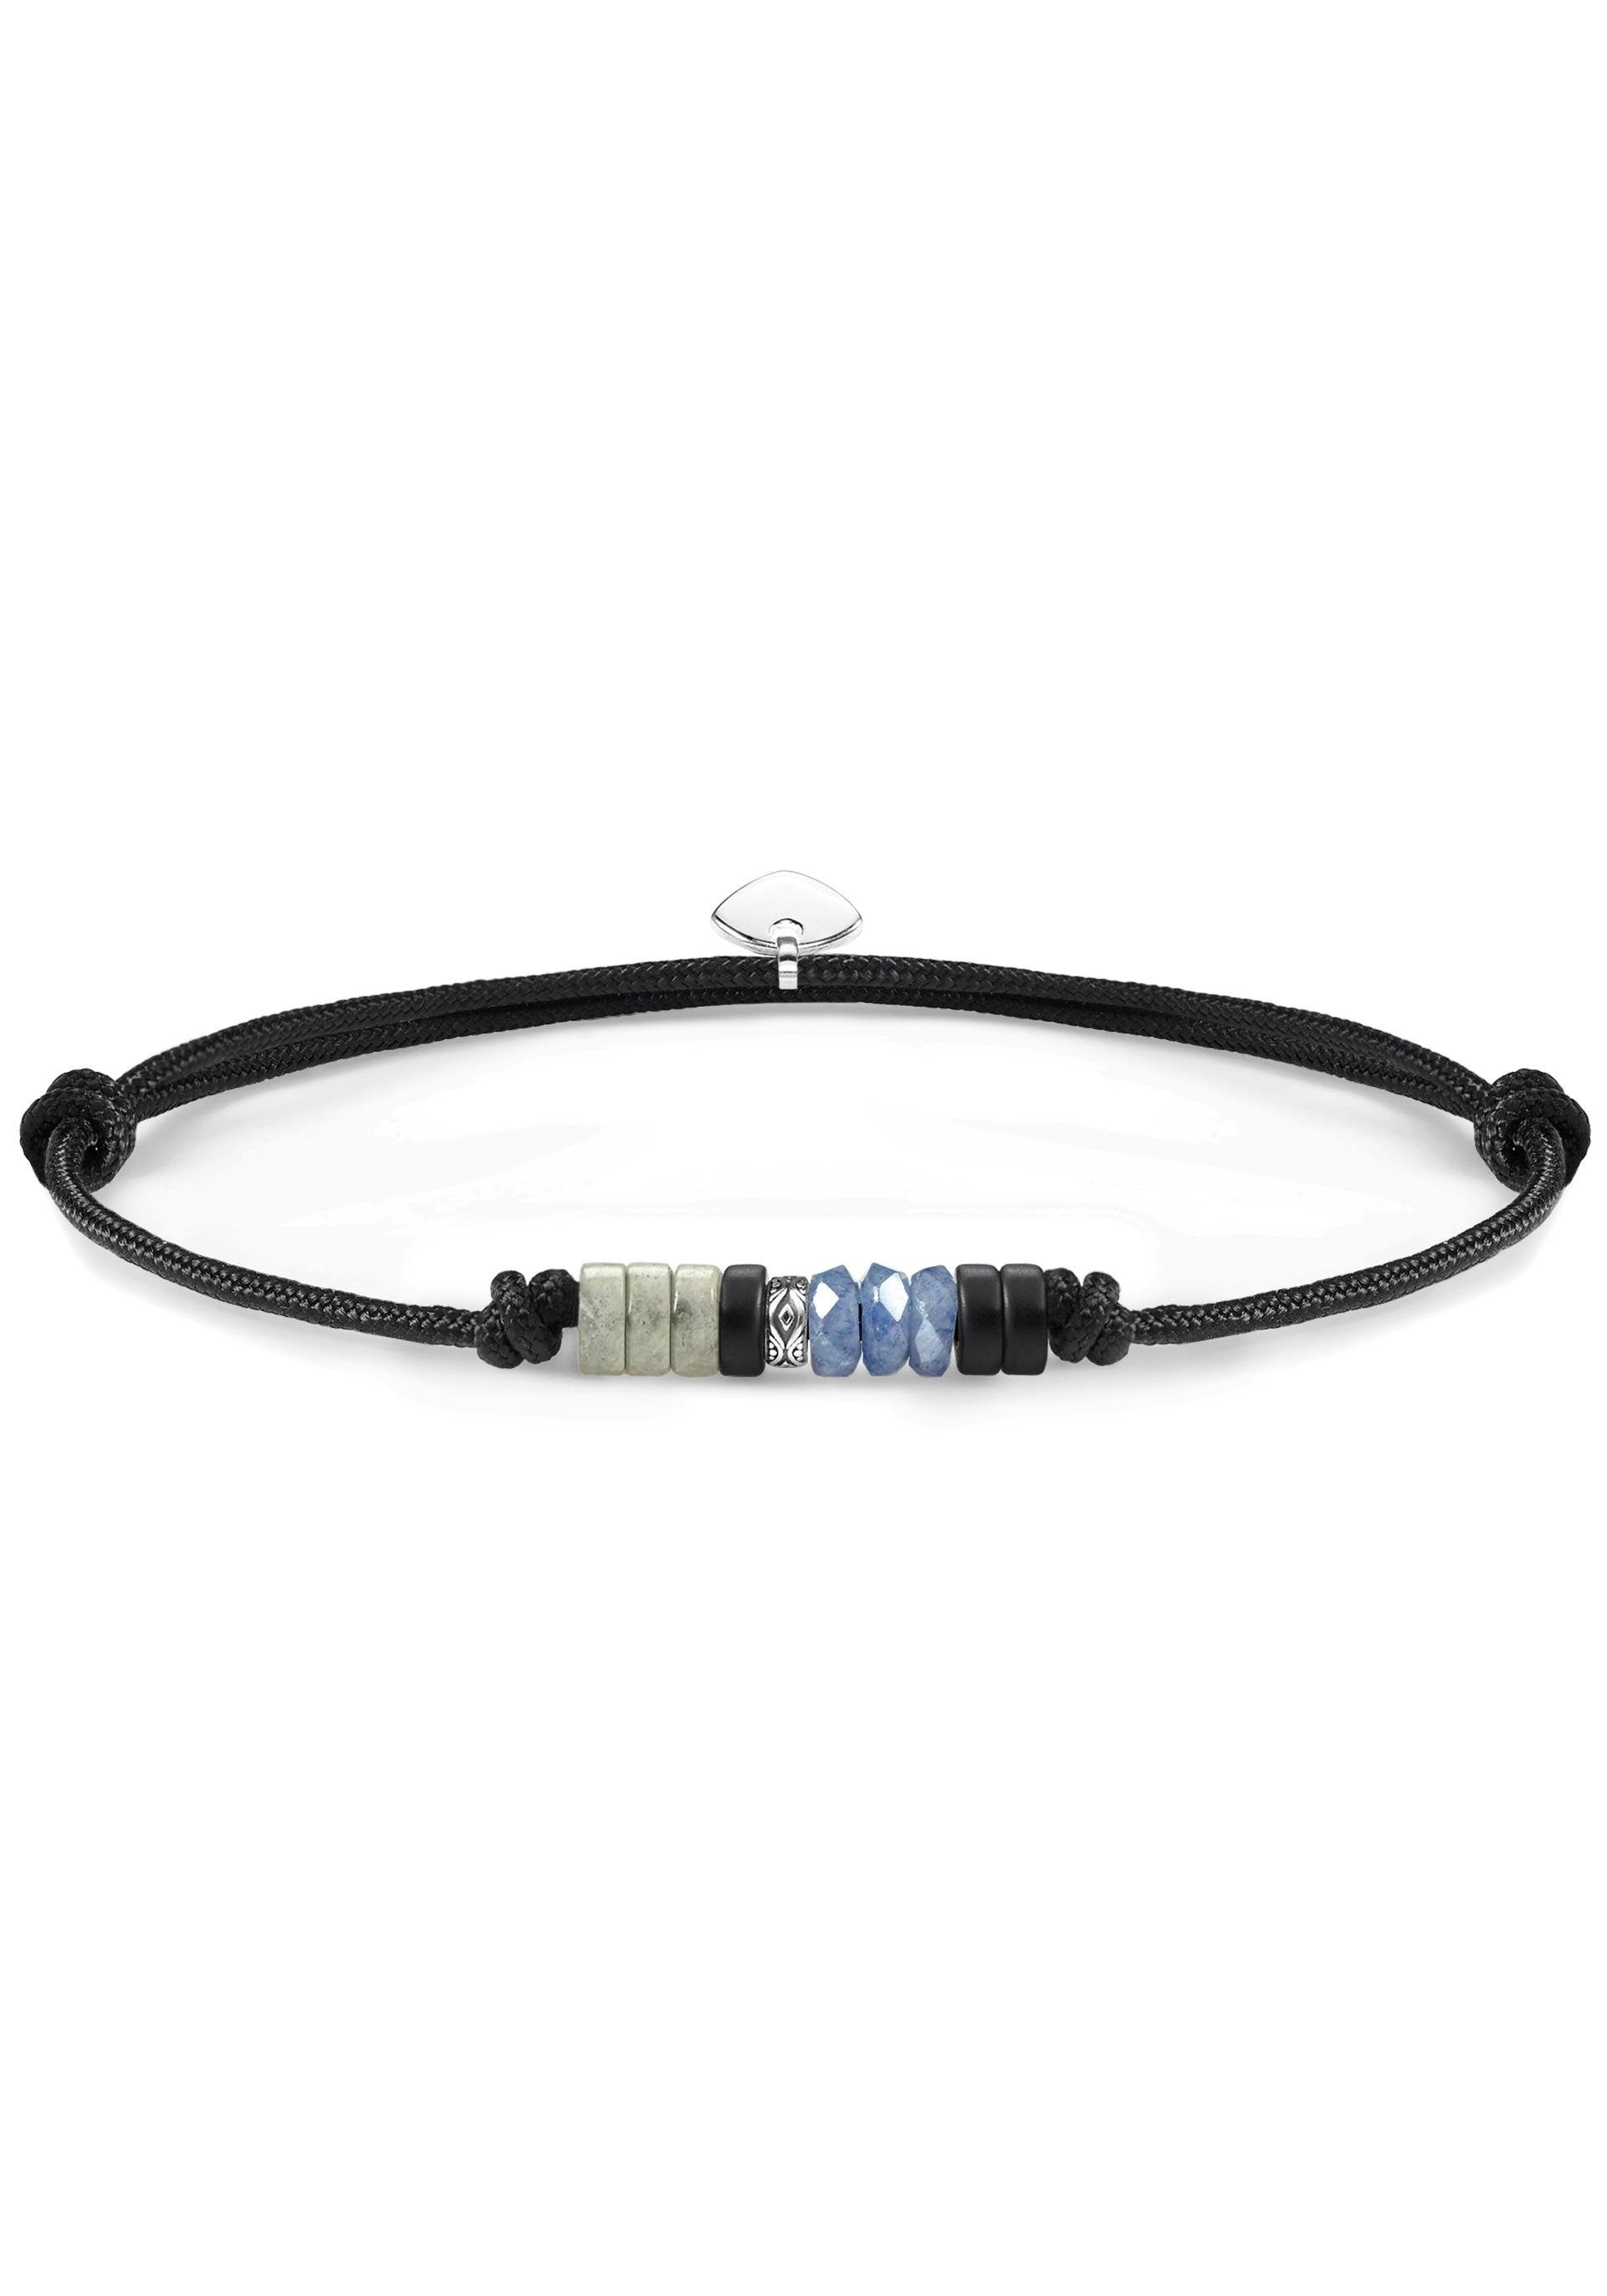 THOMAS SABO Armband »Little Secret Ethno, LS090-811-7-L22v« mit Obsidian, Dumortierit und Labradorit